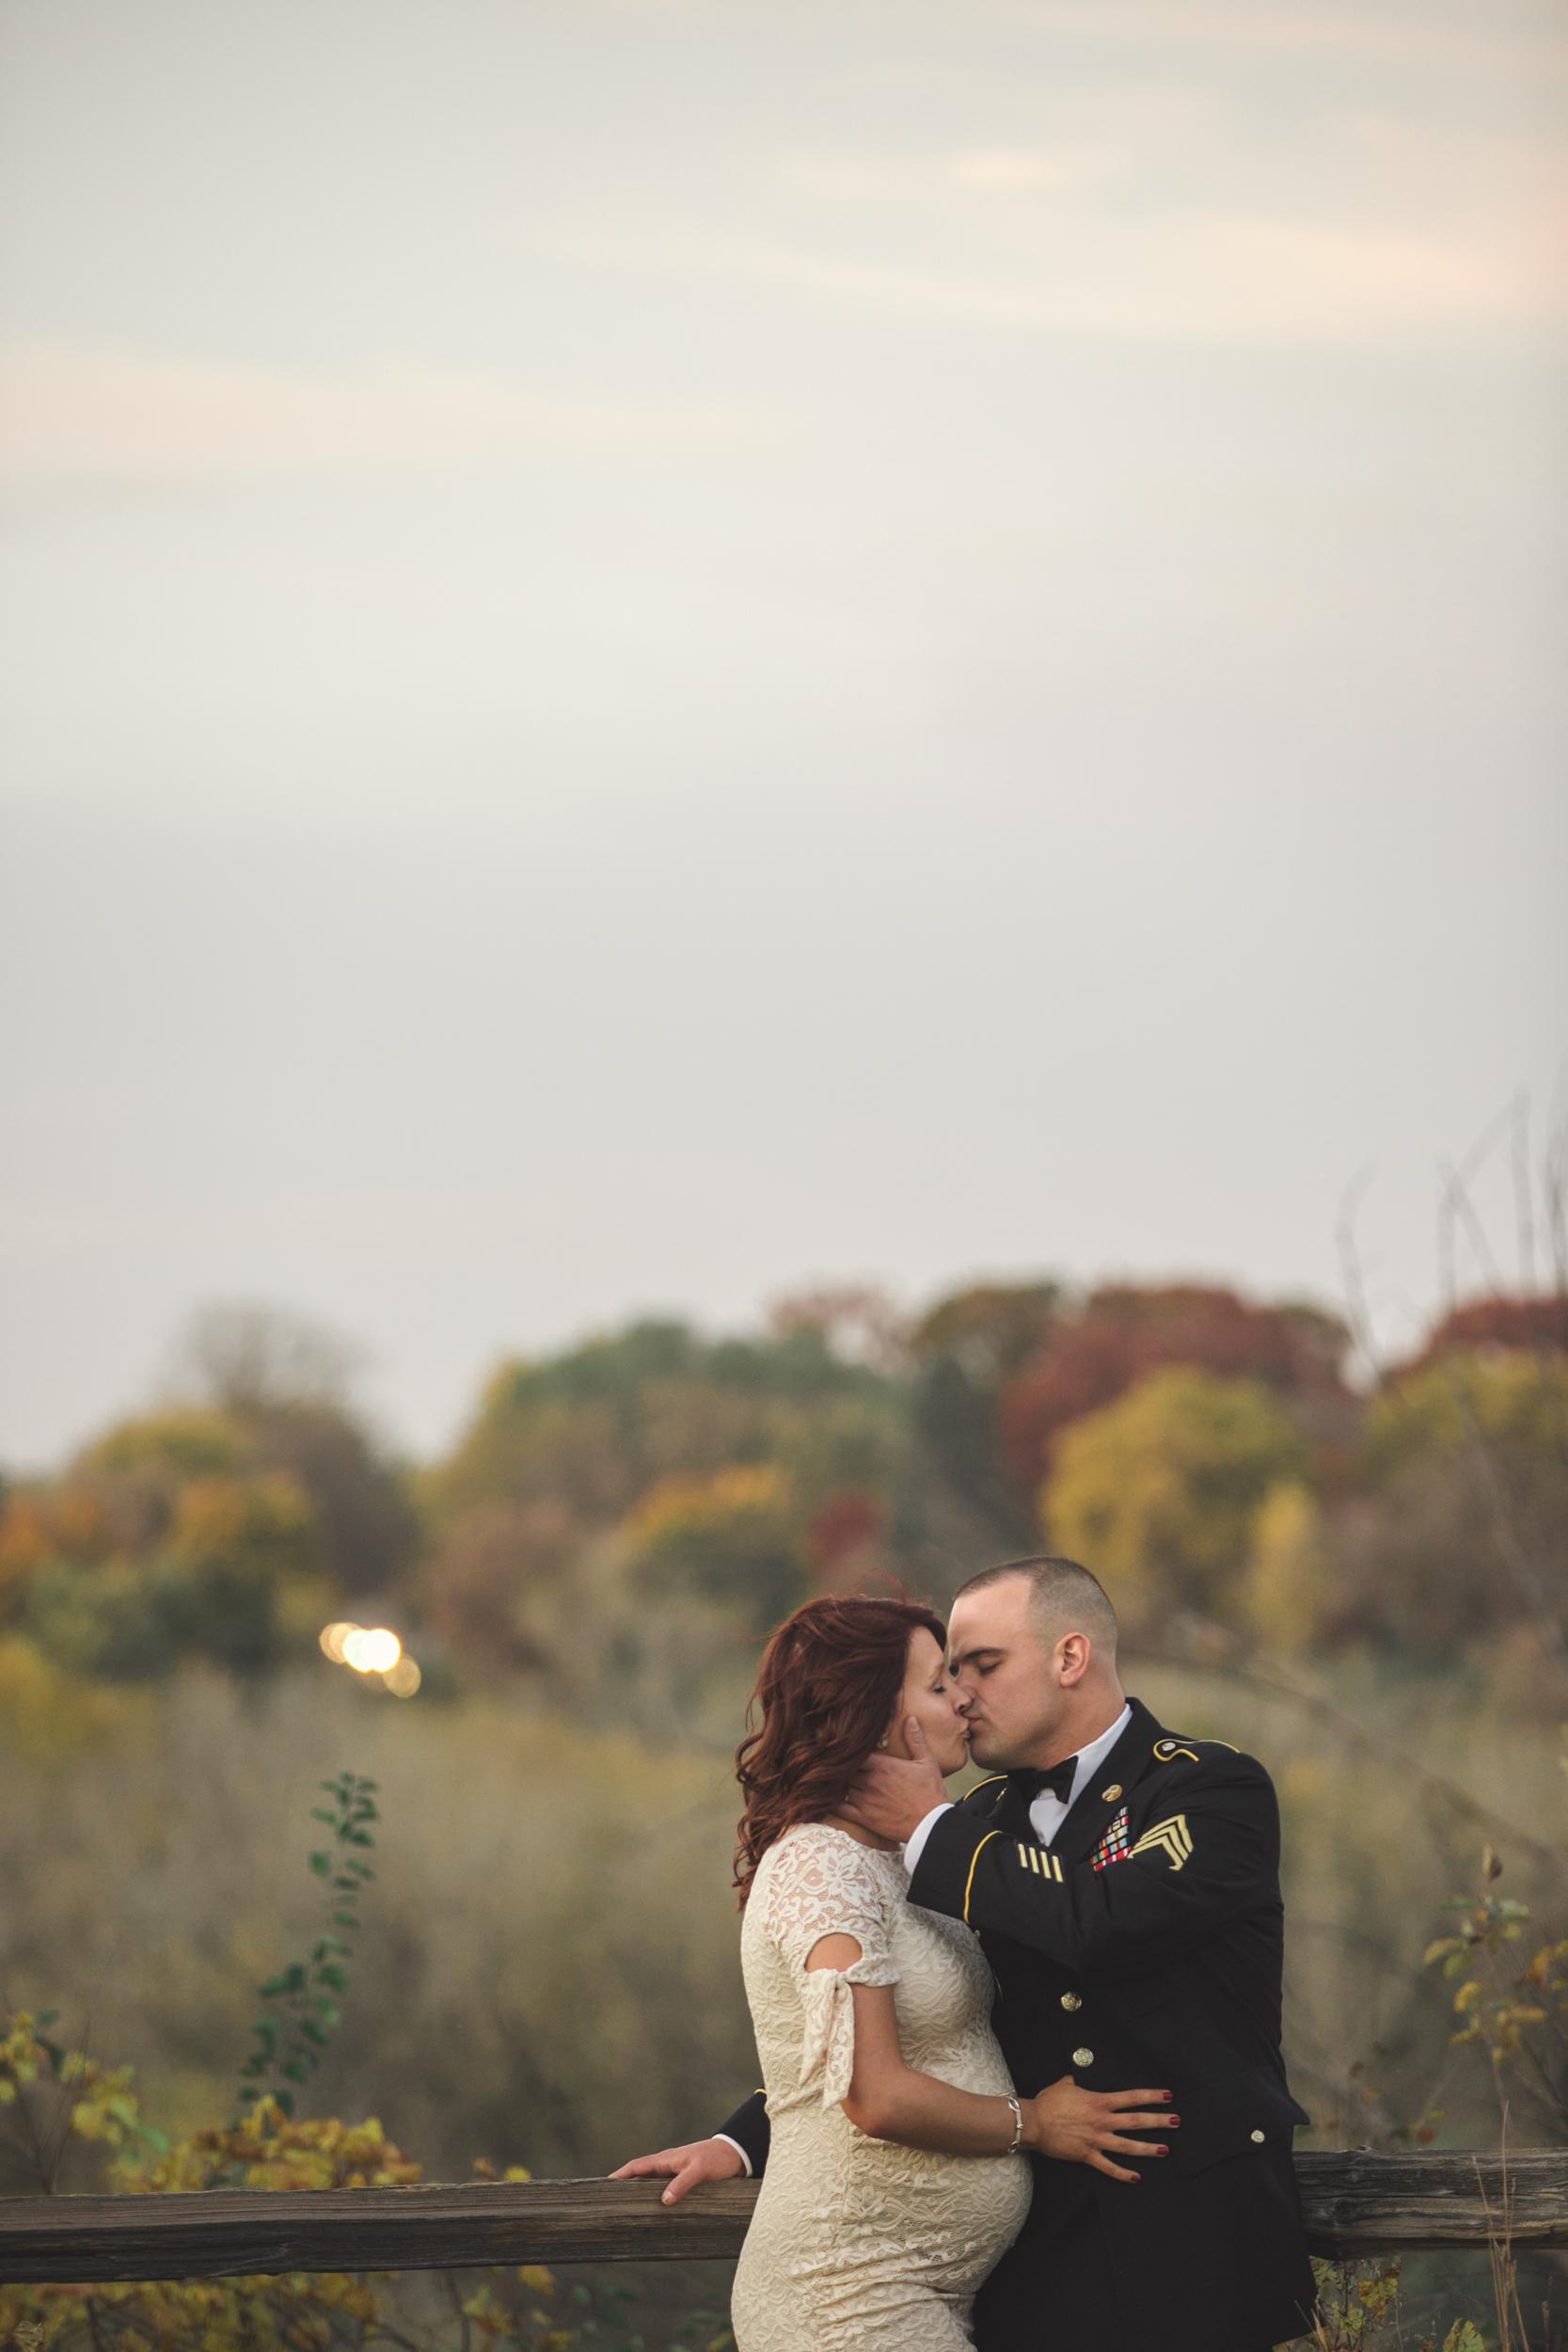 Fort Snelling Elopement St. Paul, MN, Fort Snelling Elopement, Military Elopement, Intimate Military Wedding, intimate elopement wedding-www.rachelsmak.com43.jpg